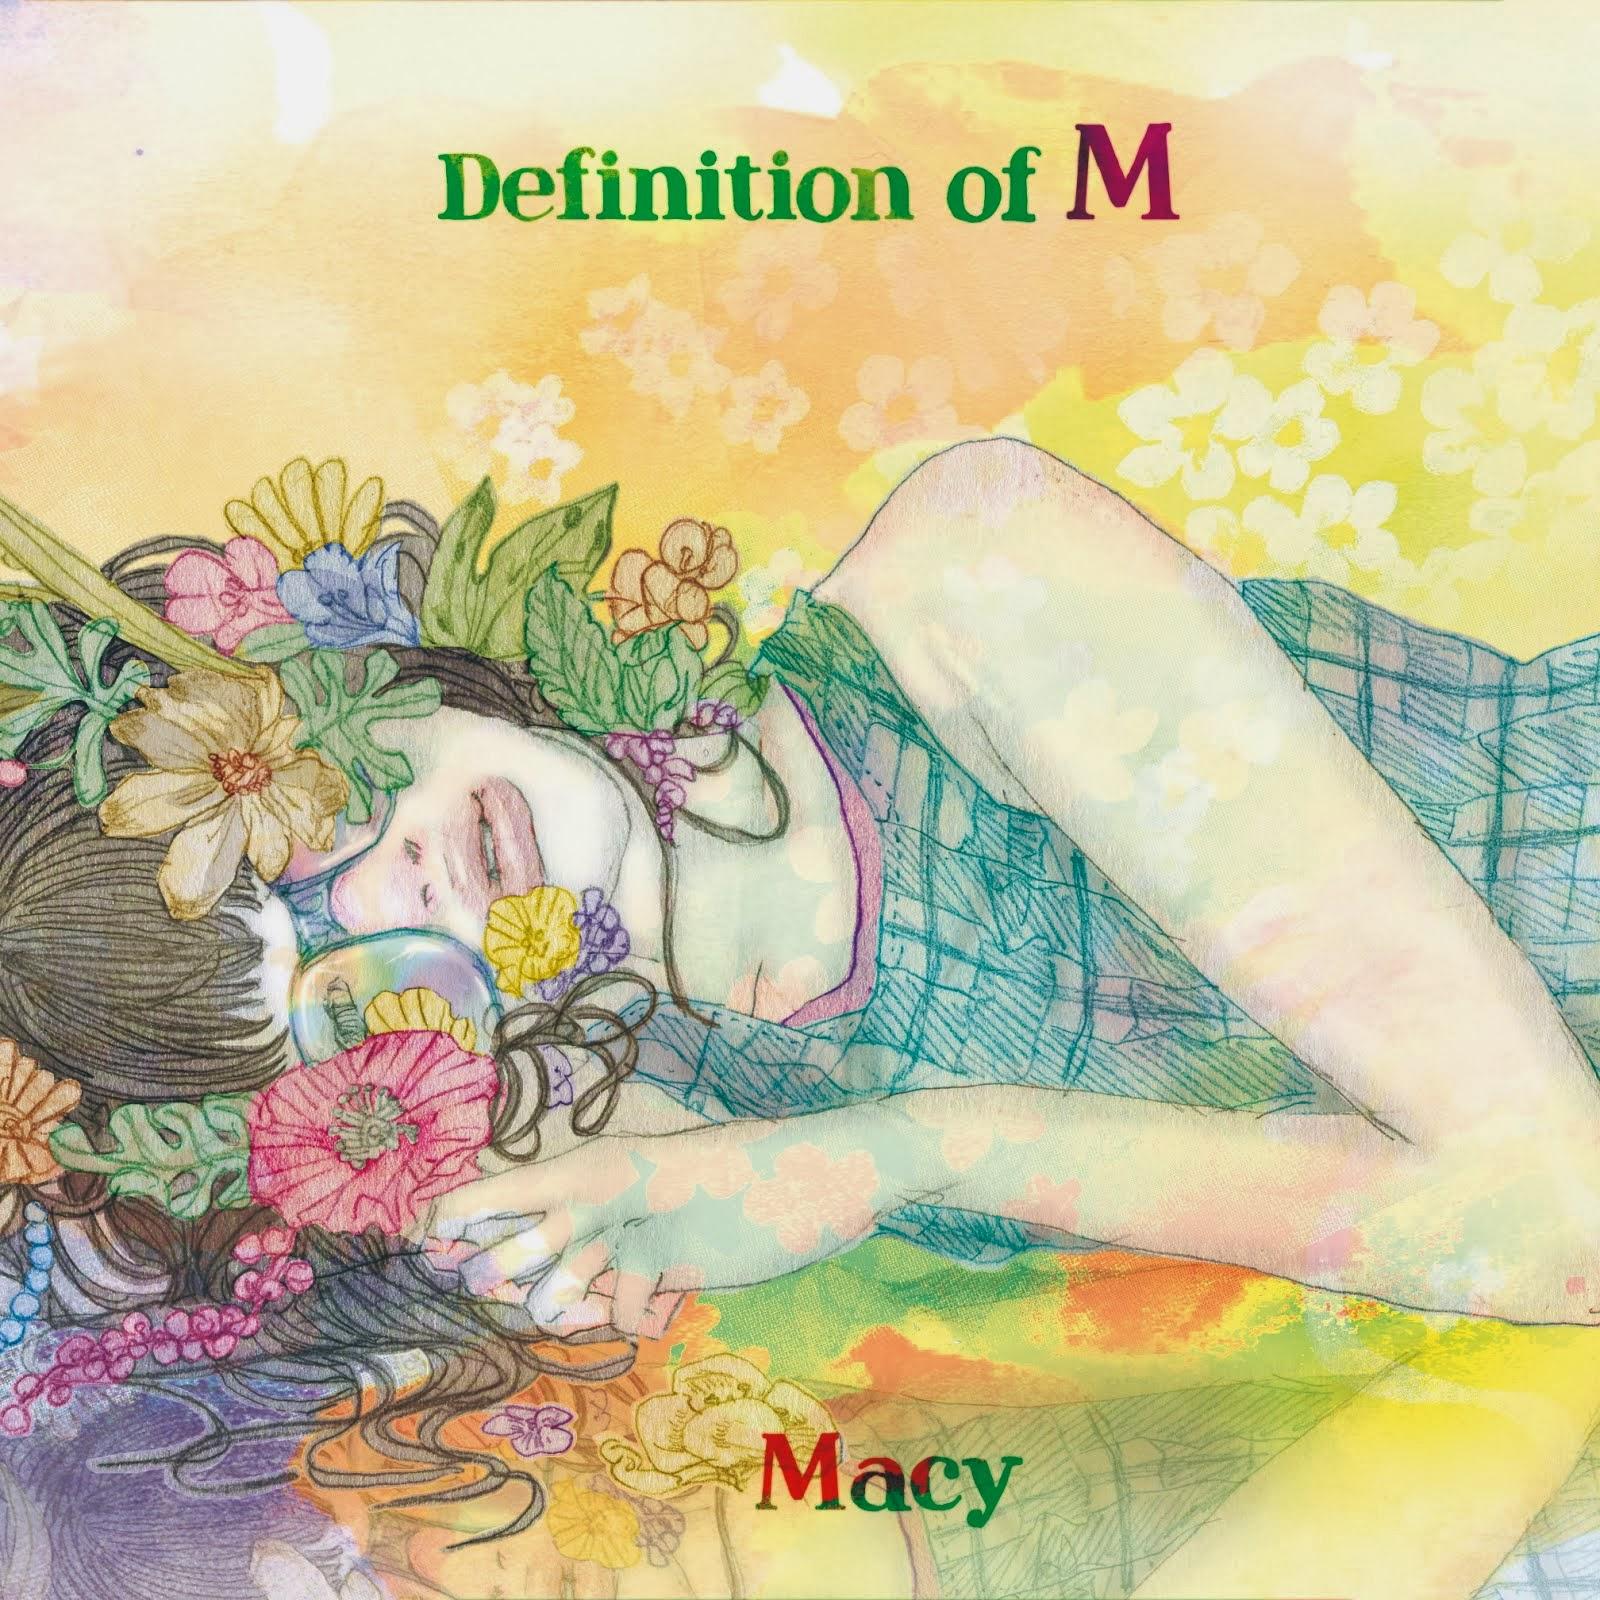 AmazonでmacyのCDを購入できます!